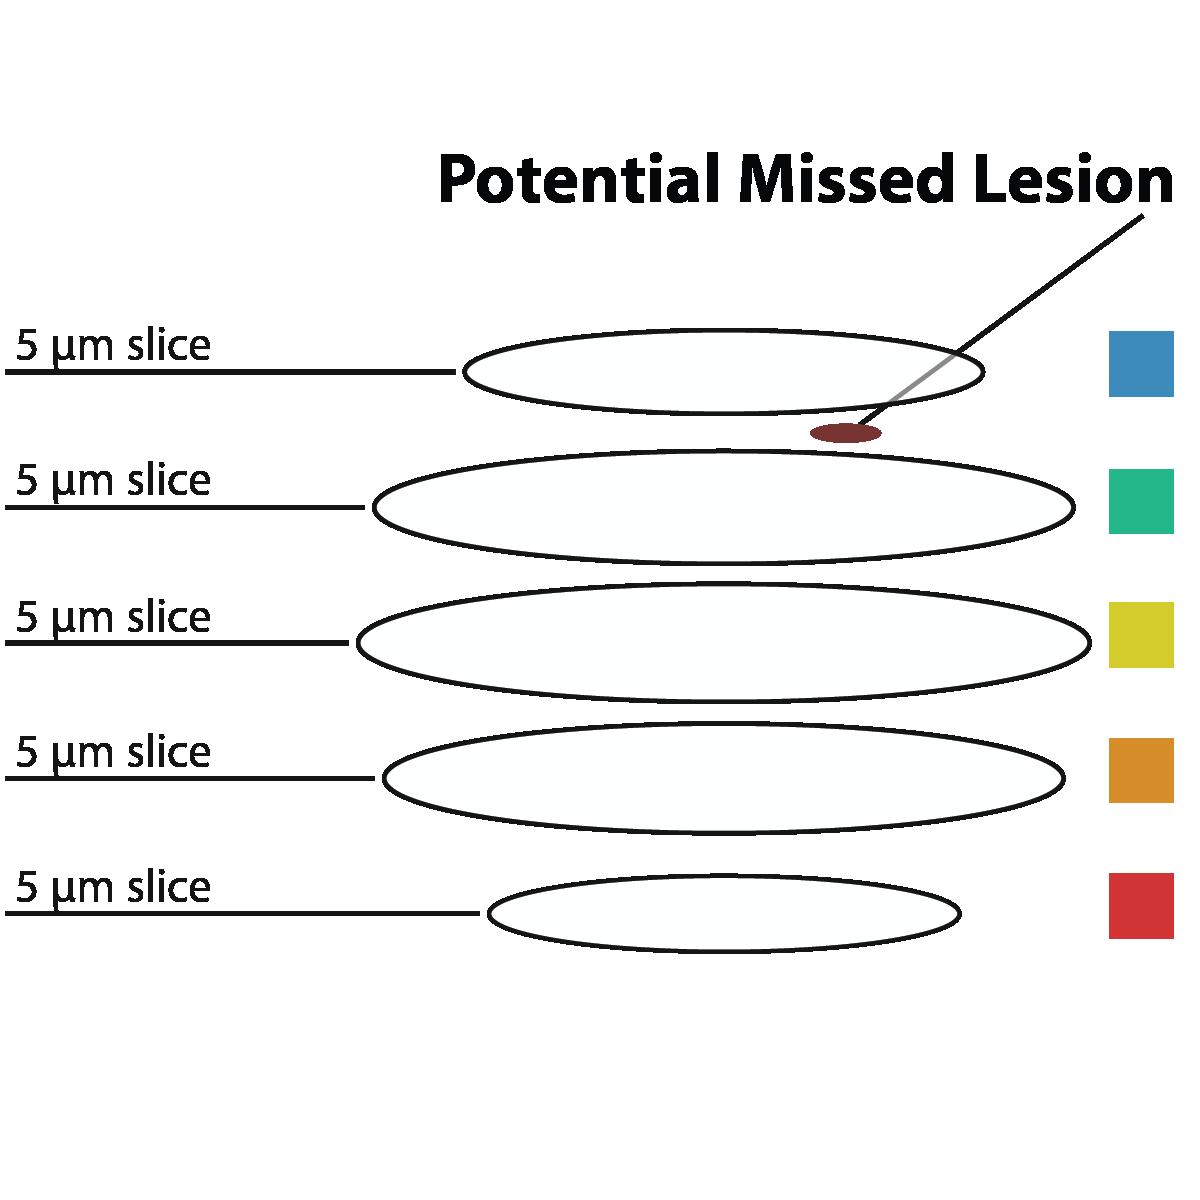 2d FFPE Comparison 5 micron sections miss data